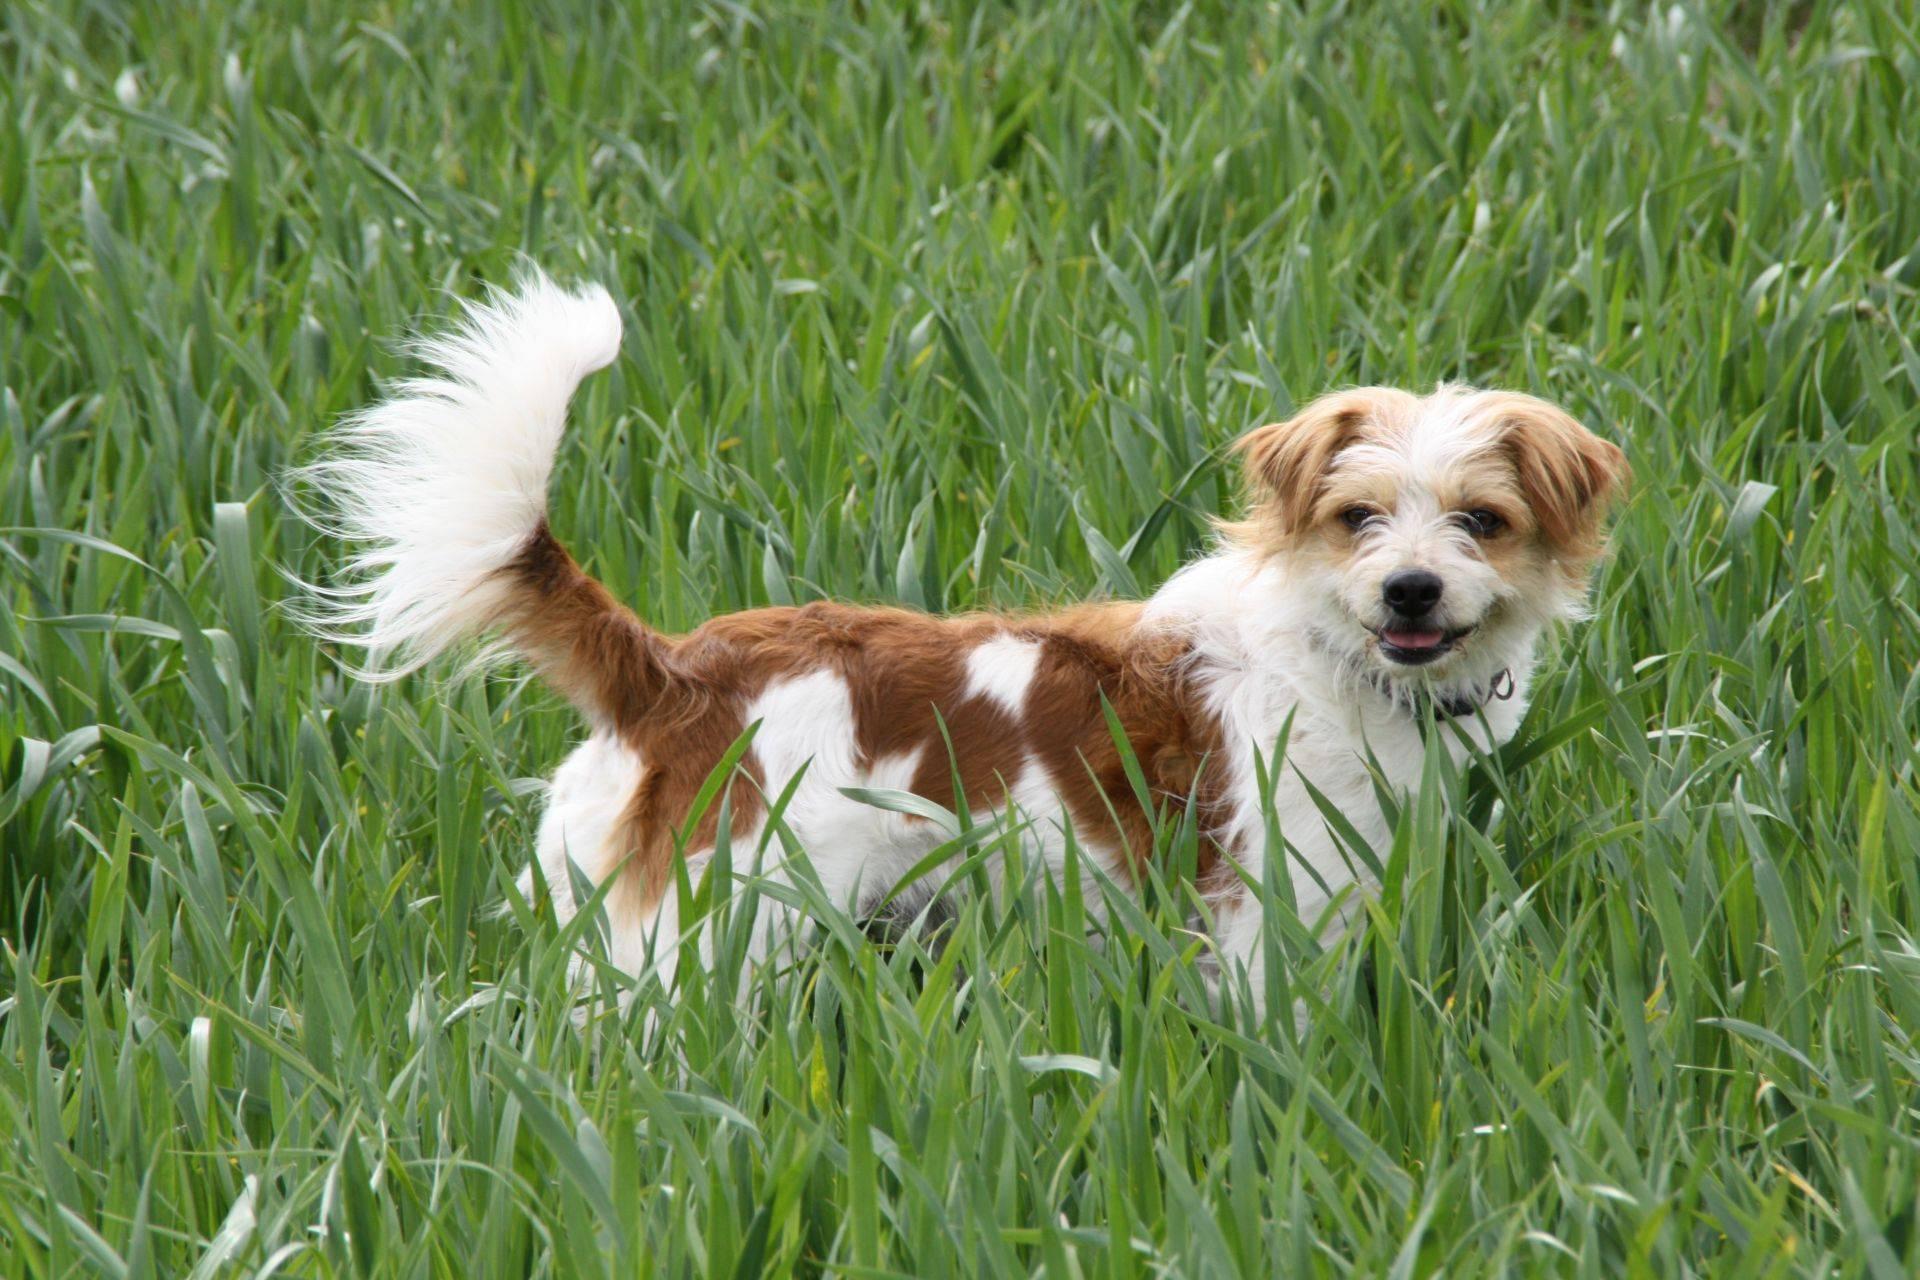 Леонбергер собака. описание, особенности, уход и цена леонбергера | sobakagav.ru